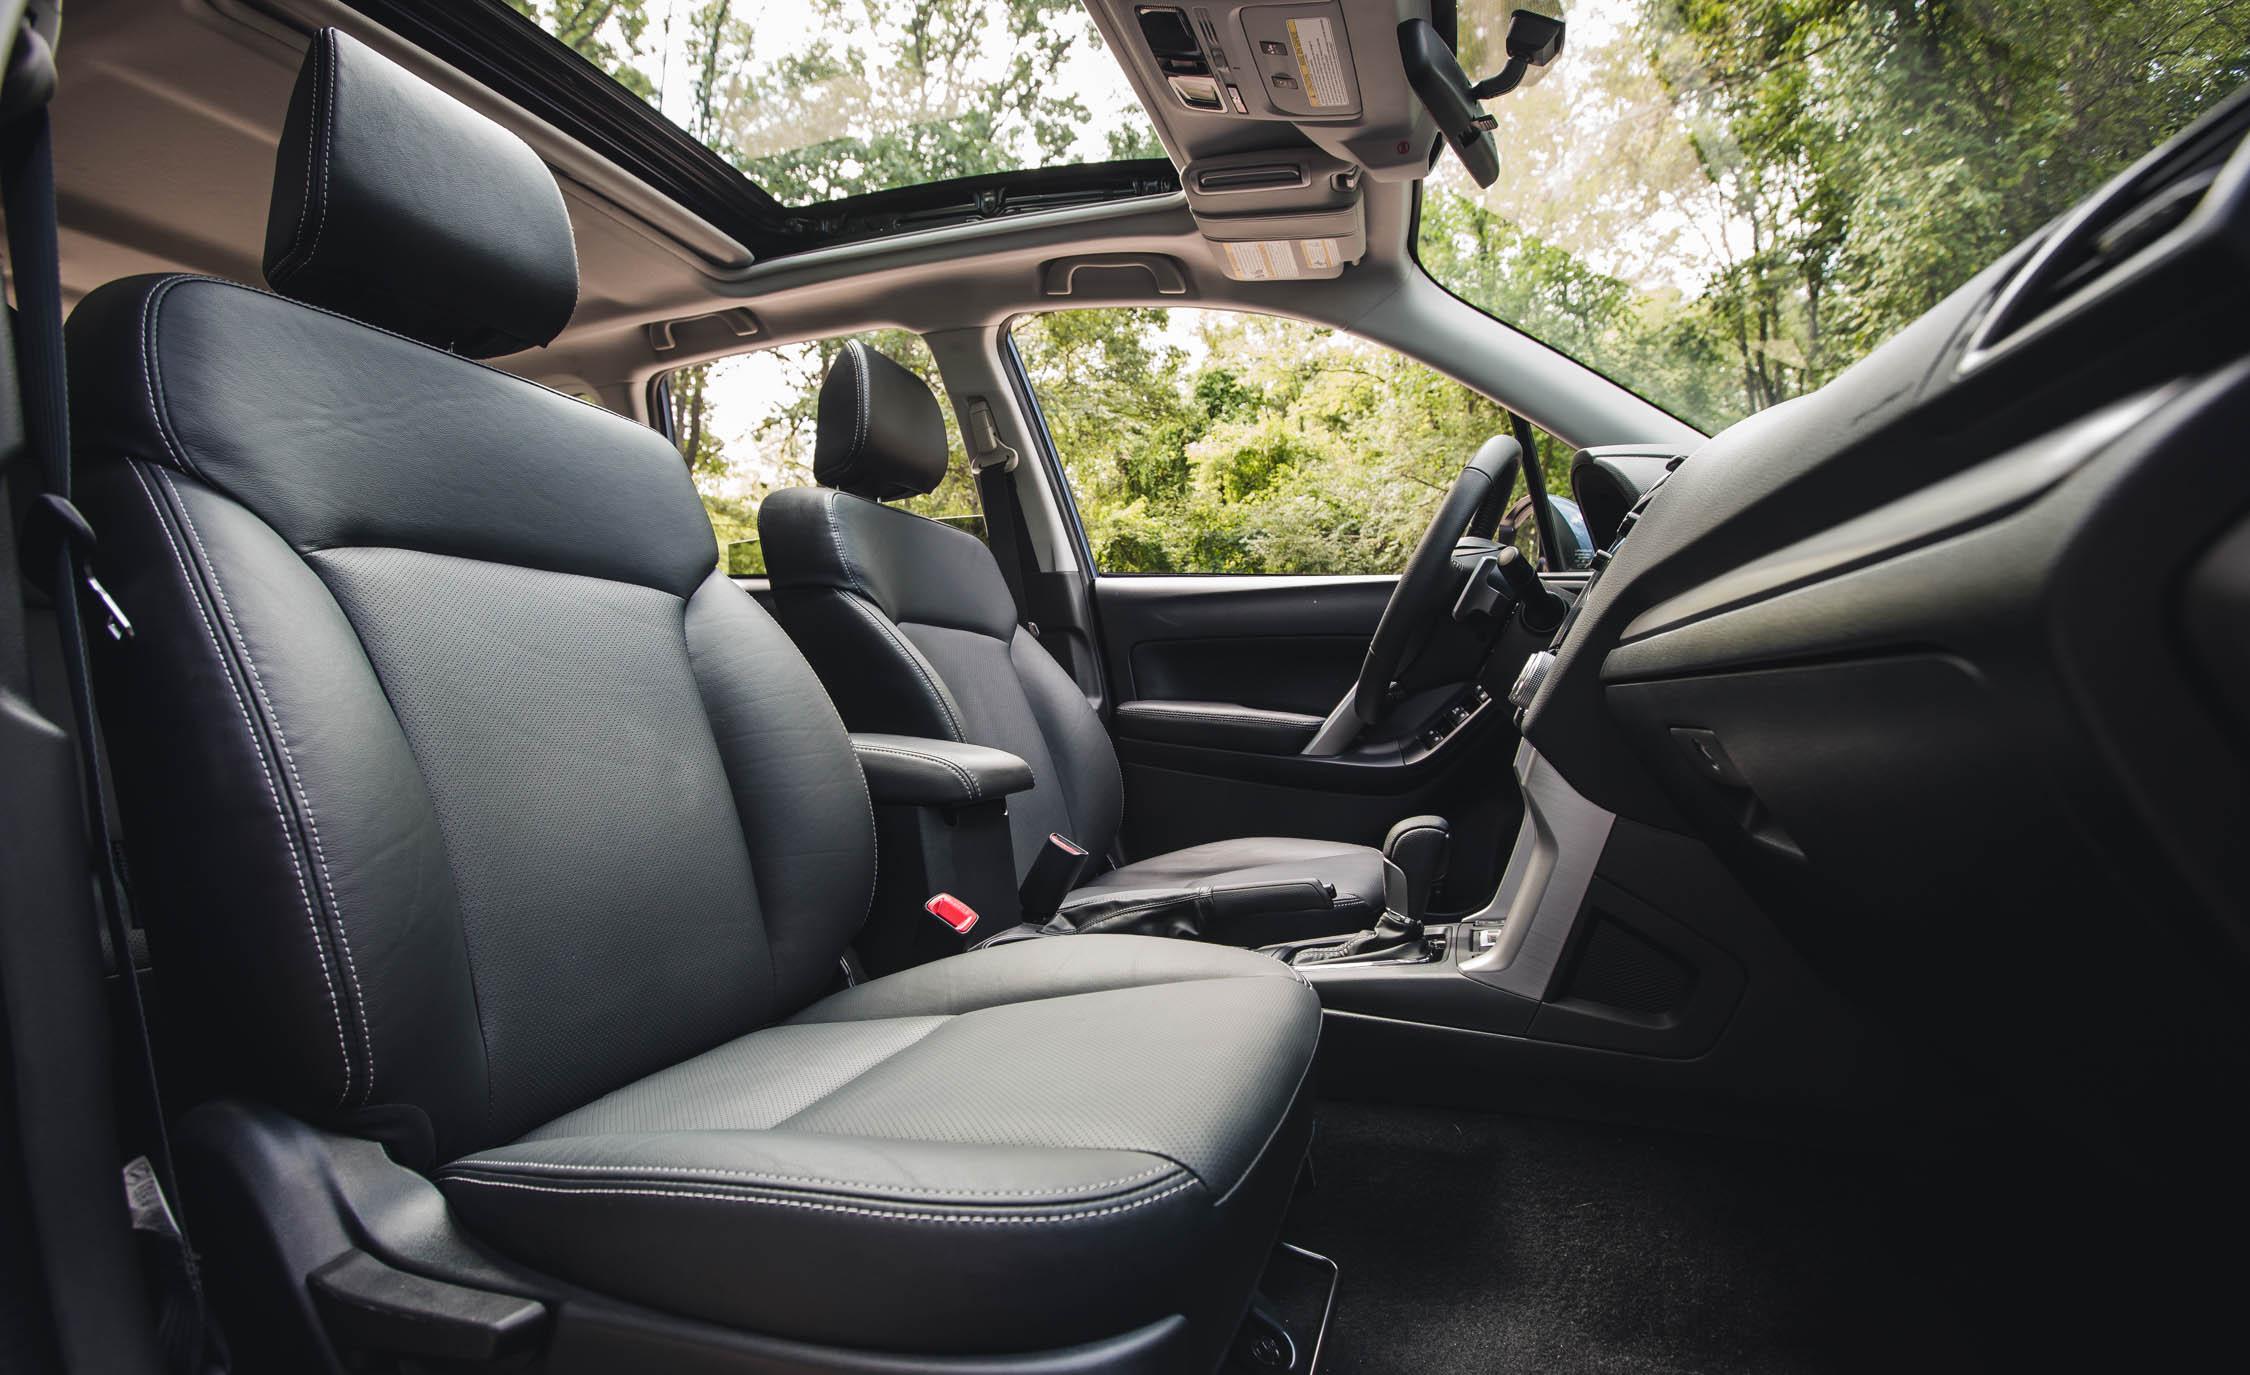 2016 Subaru Forester 2.0XT Touring Interior Seats Front